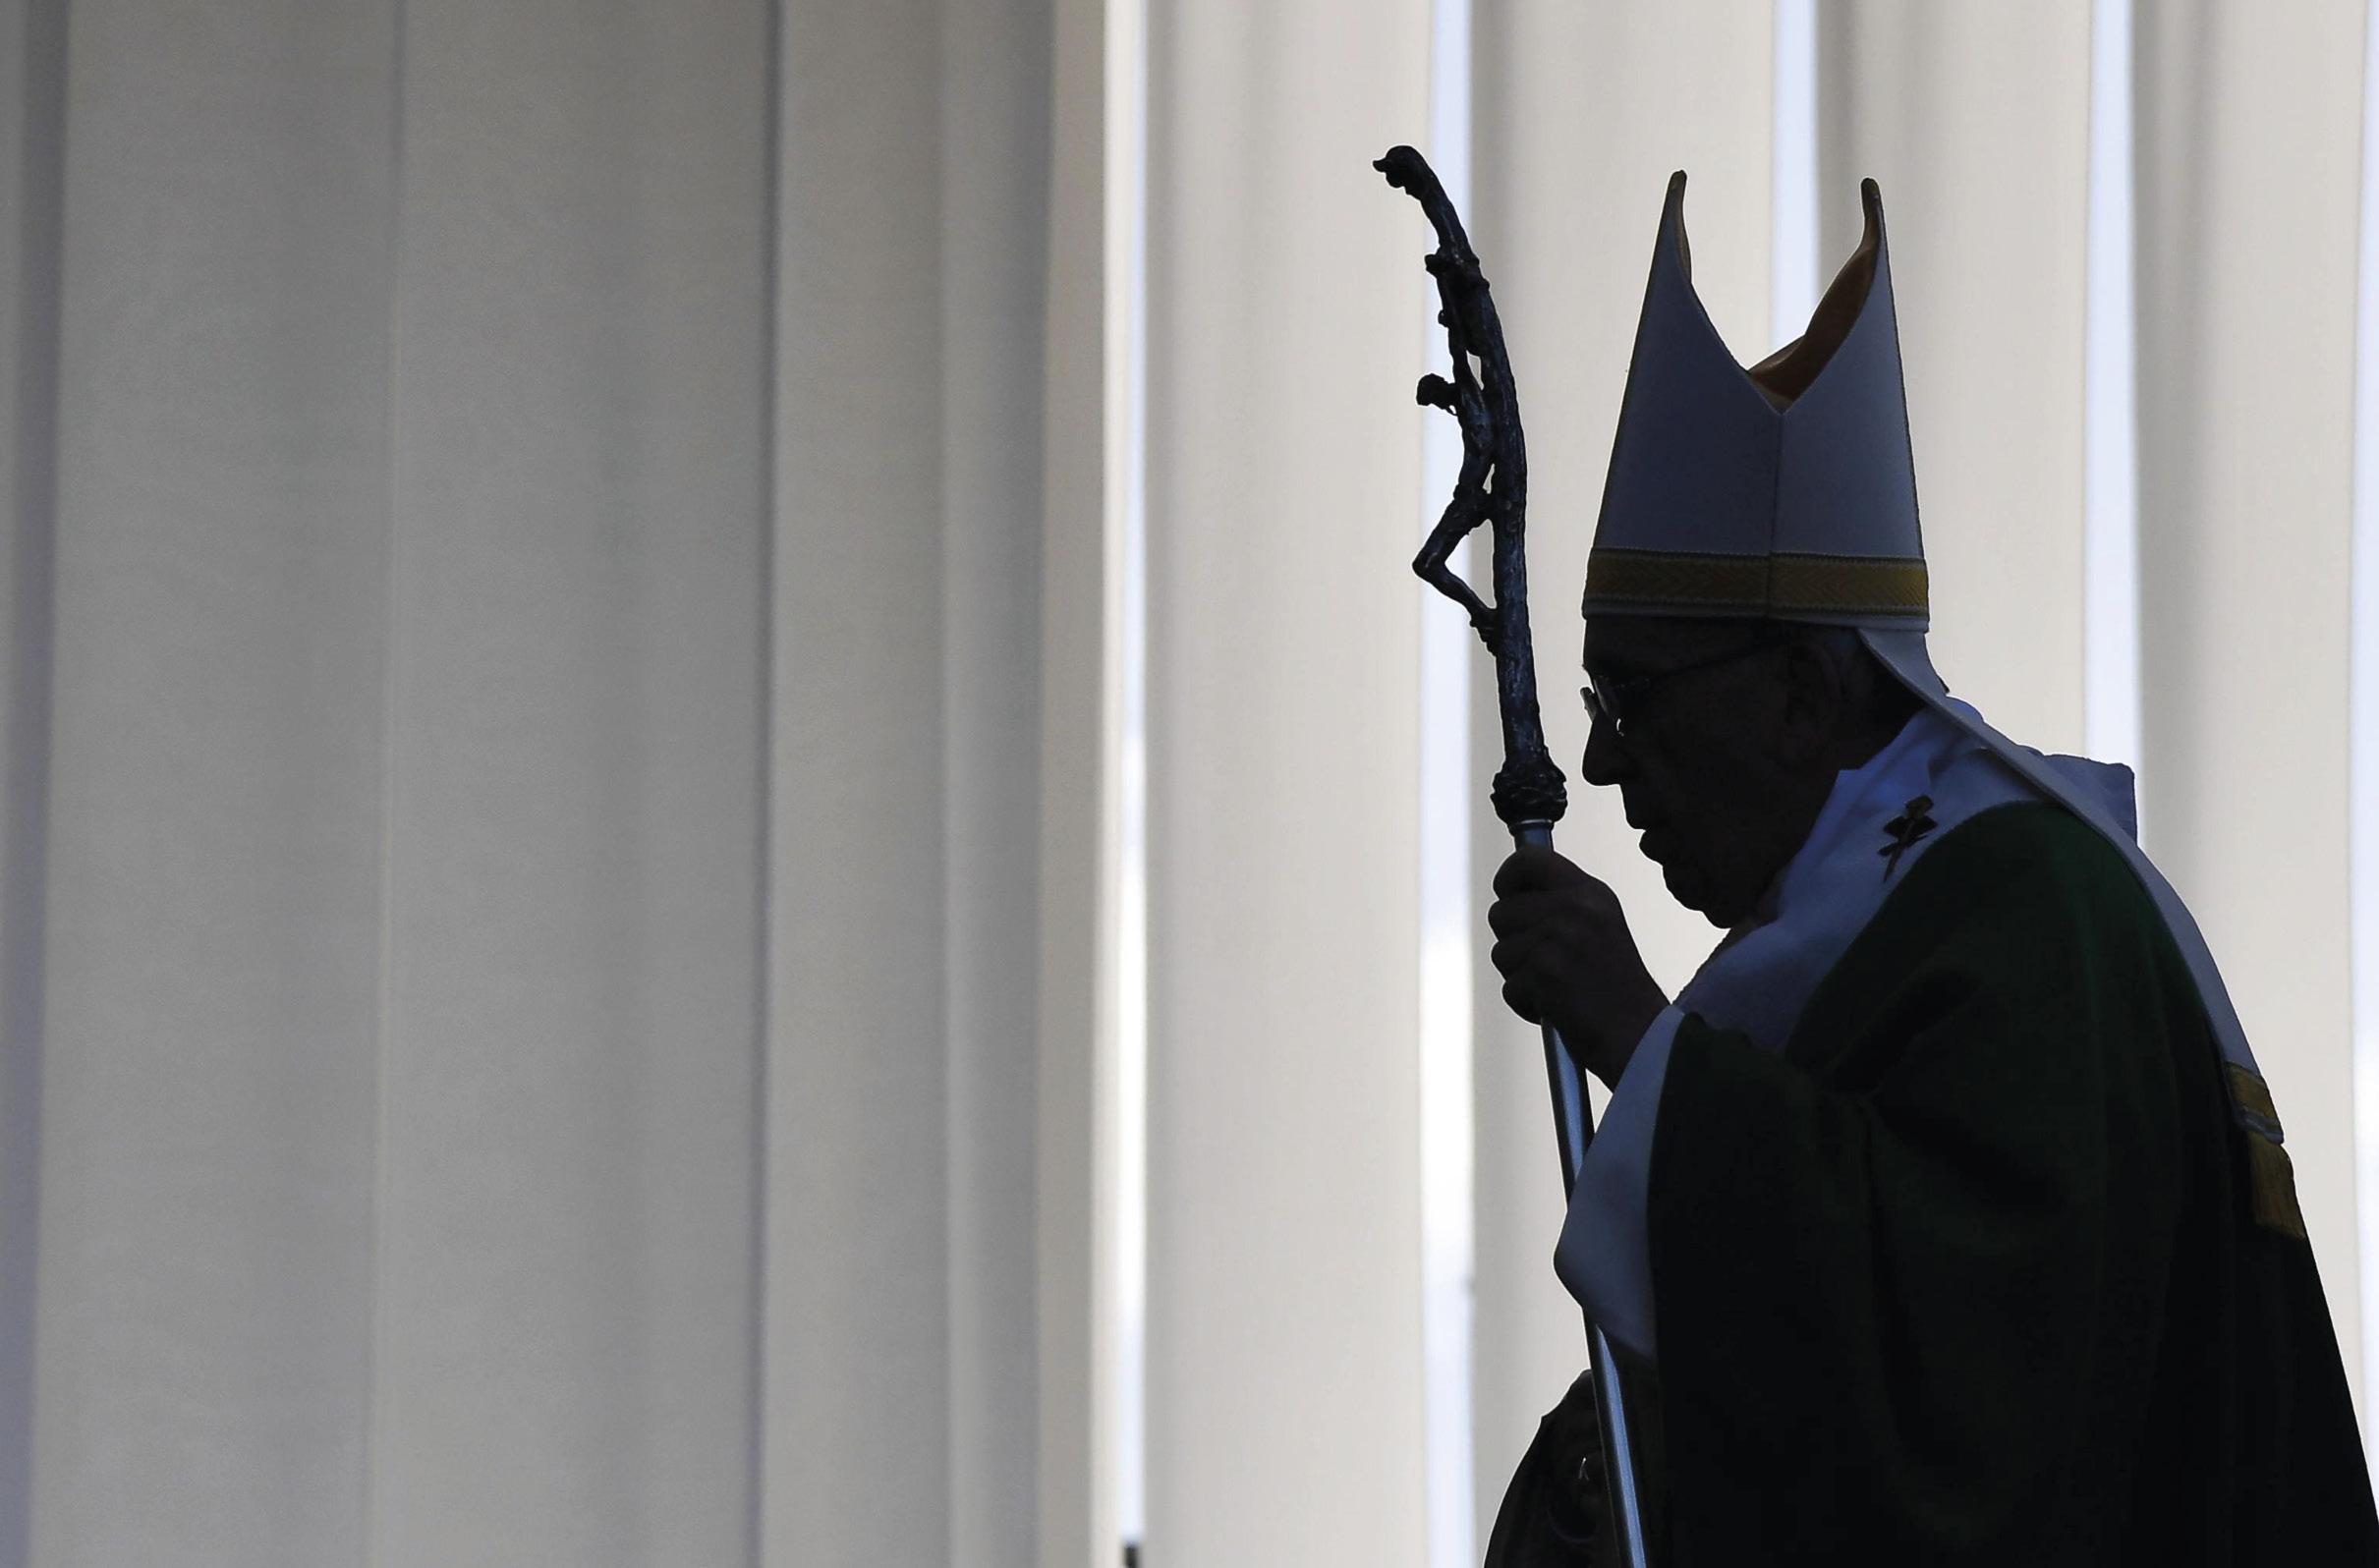 Papa Francisco na Missa no Parque de Santakos, Kaunas, Lituânia, 23 de setembro de 2018. EPA / ALESSANDRO DI MEO